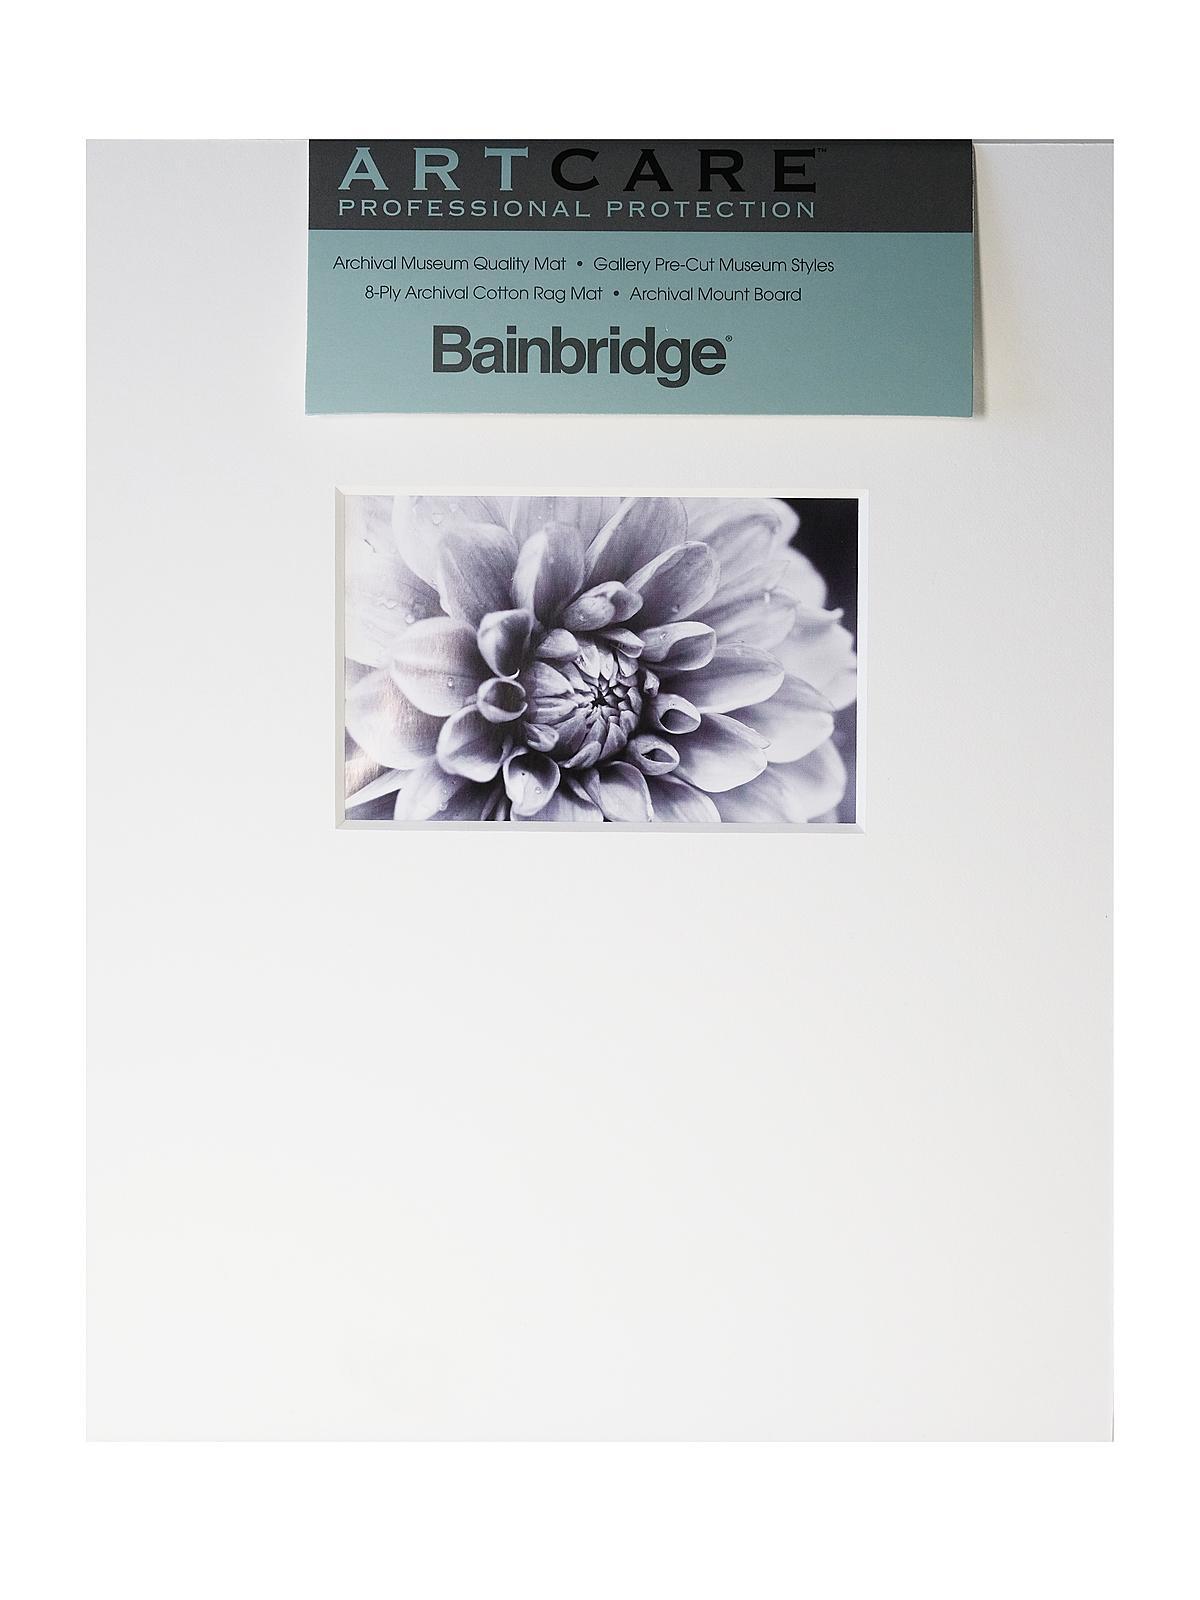 artcare alplamat products bainbridge gemini mats mat b board bellflower blue alphamat